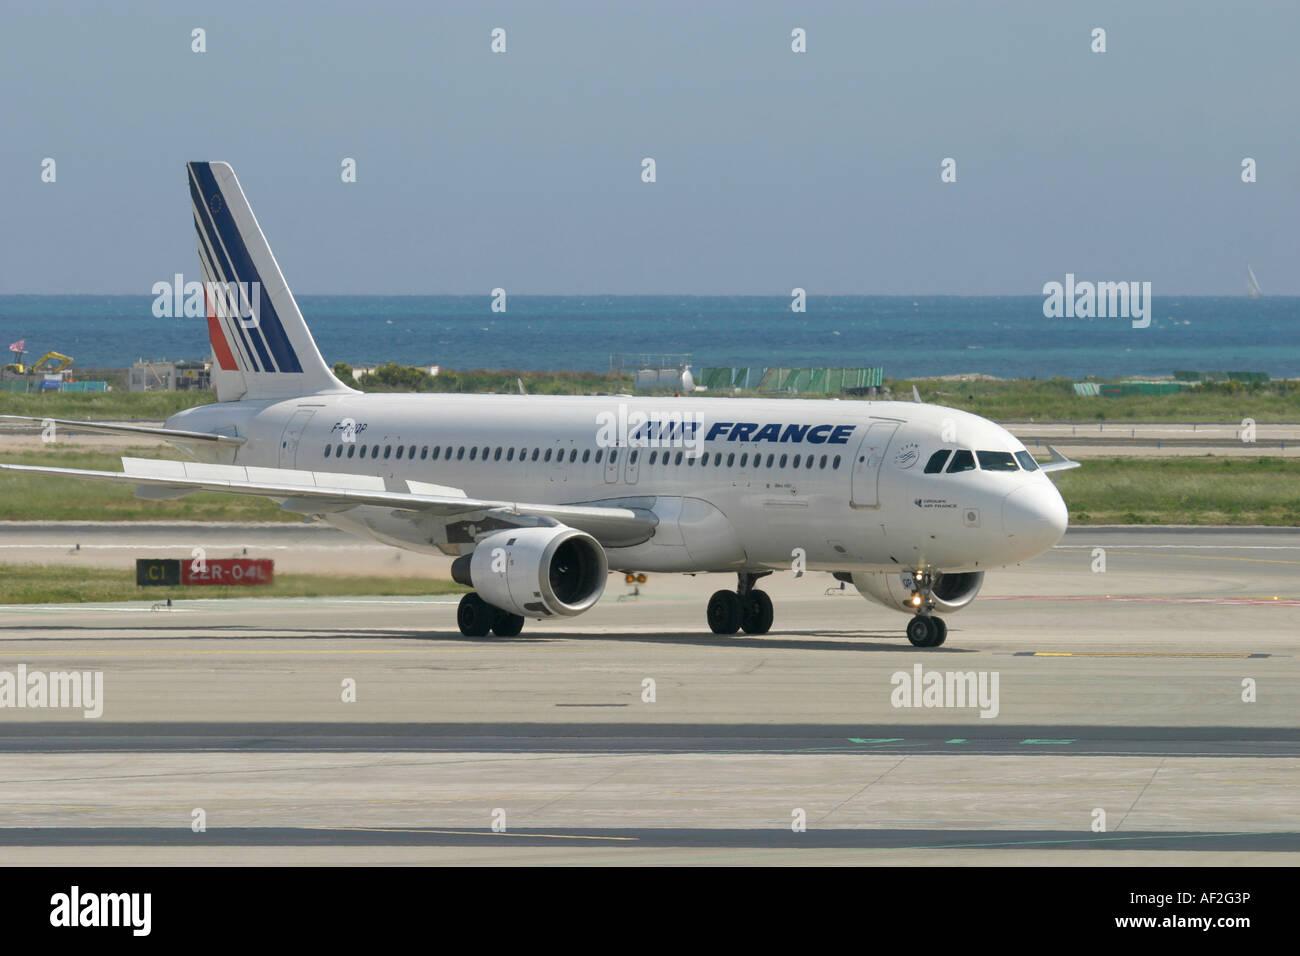 Air france airbus a320 at nice cote d 39 azur airport france for Airbus a320 air france interieur